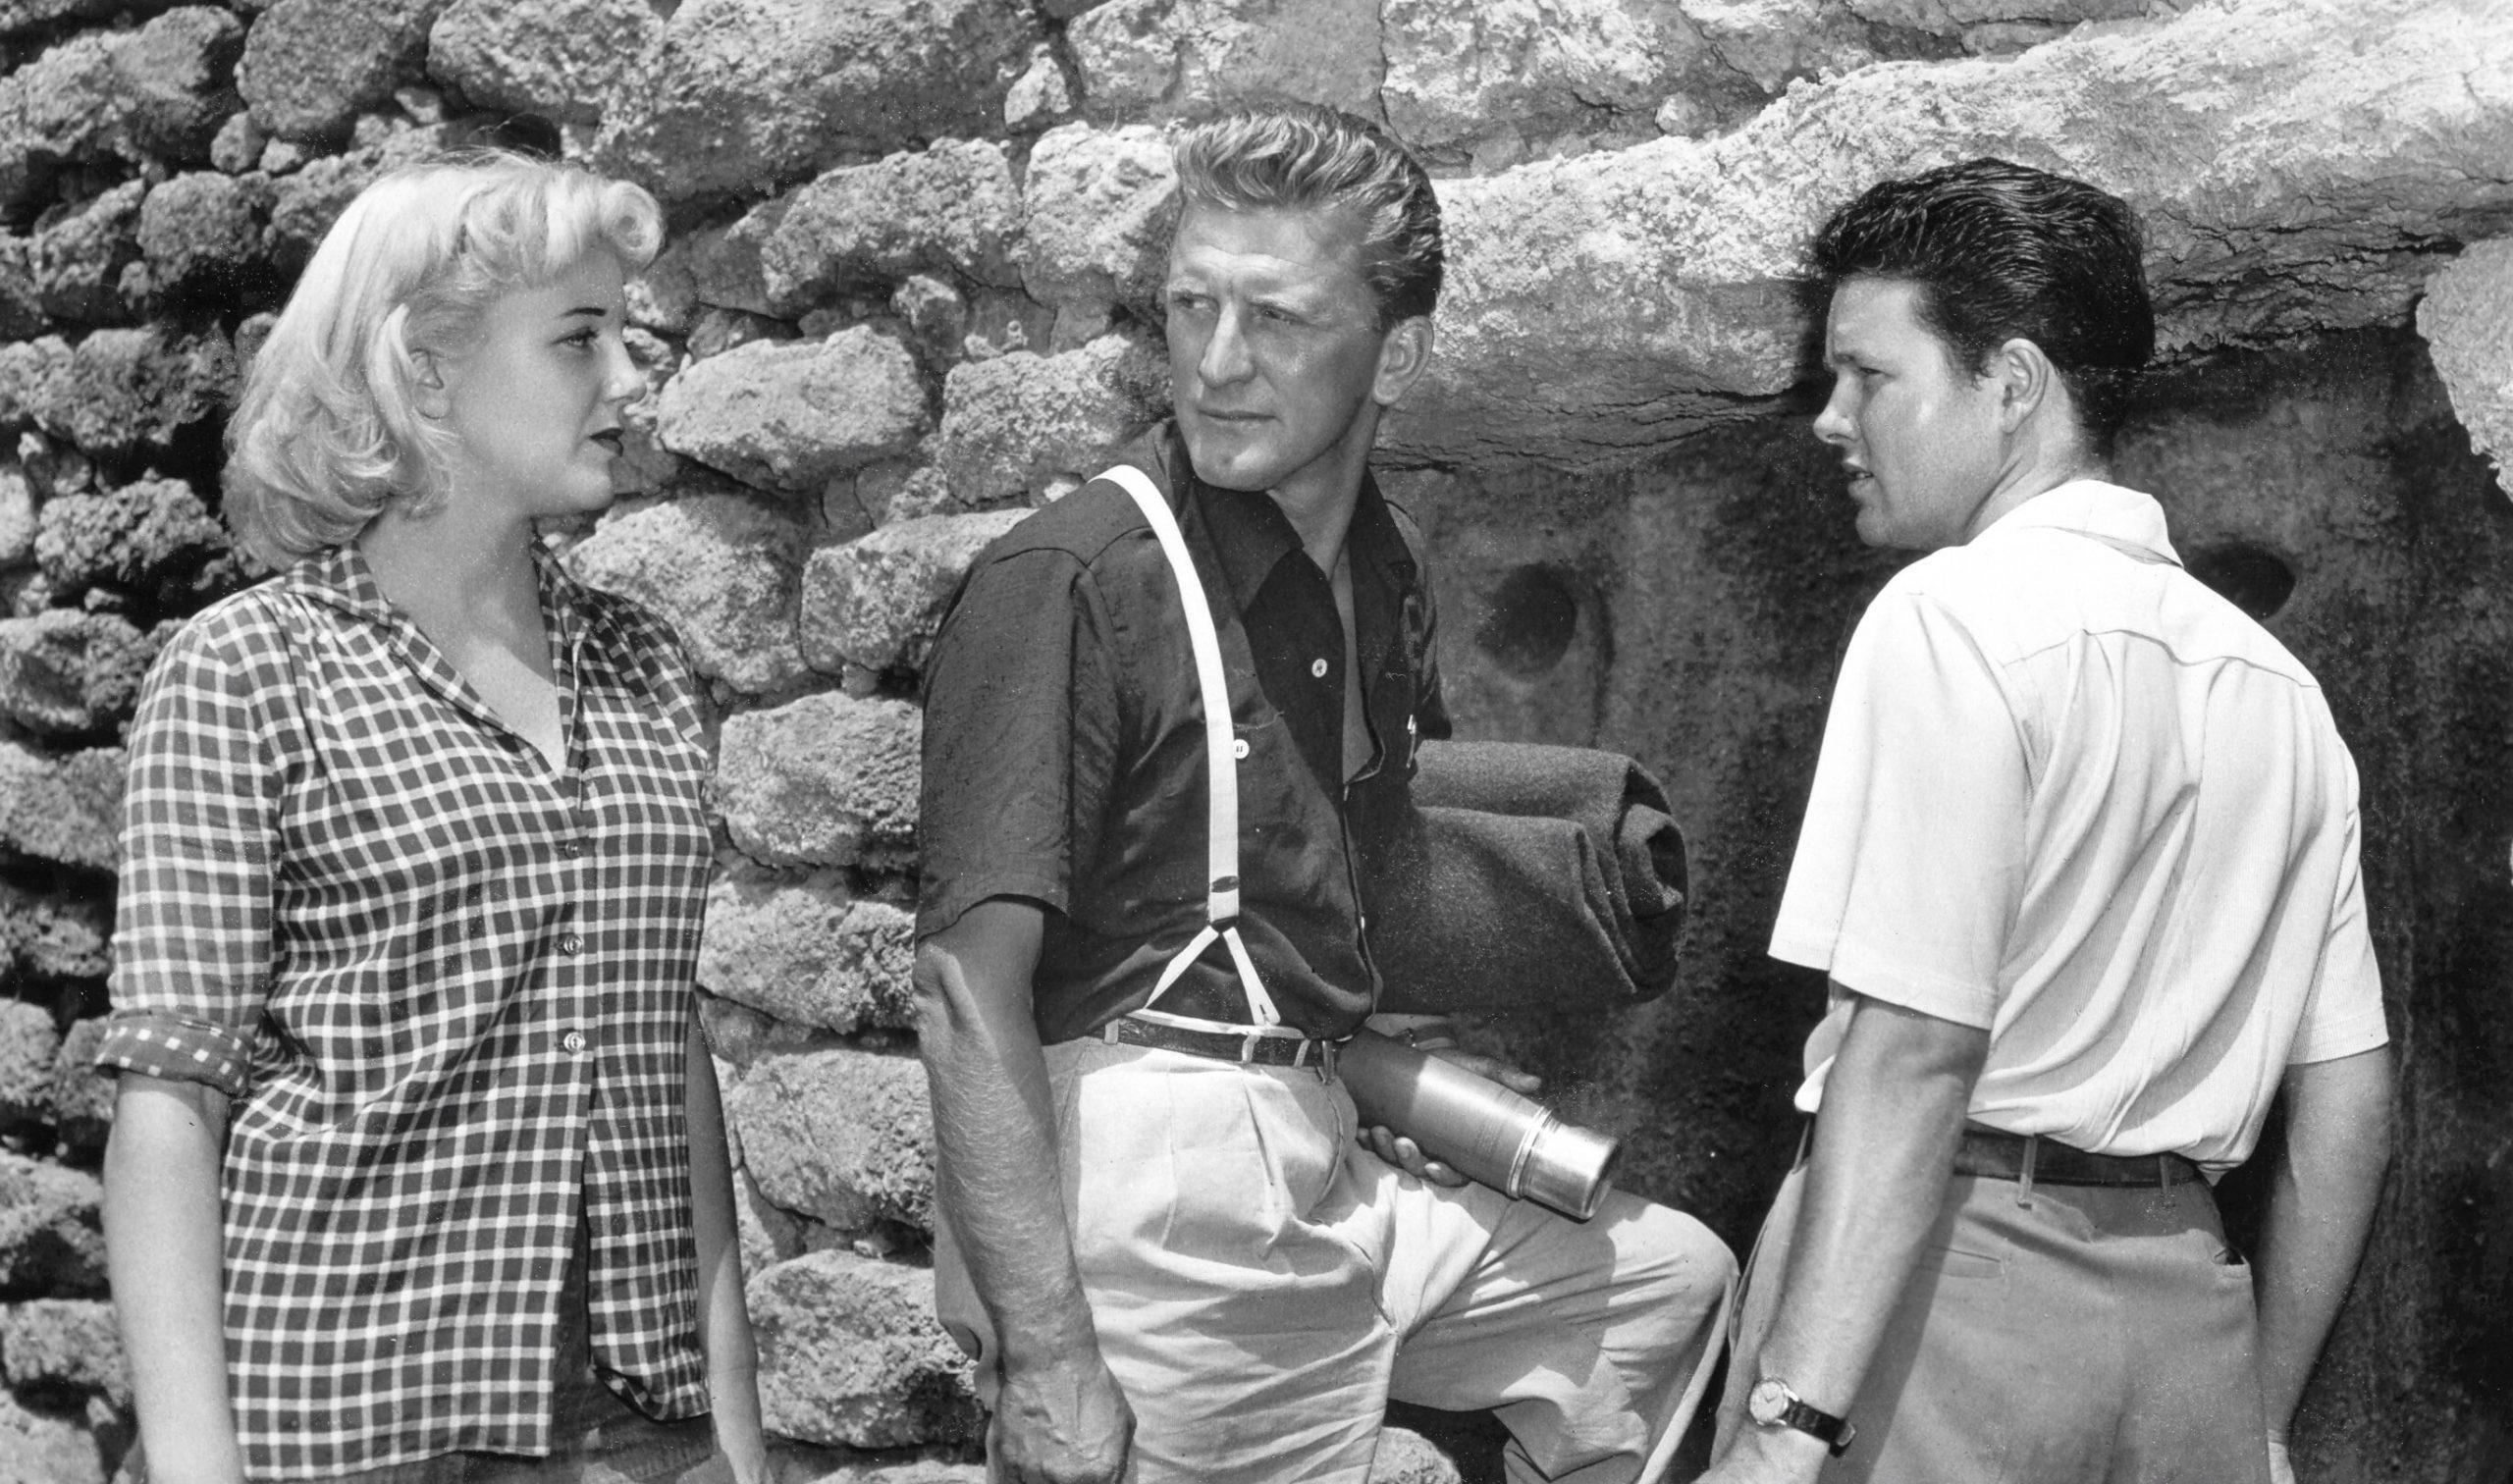 Ace In The Hole Big Carnival 1951 Kirk Douglas Jan Serling Robert Arthur Billy Wilder film movie